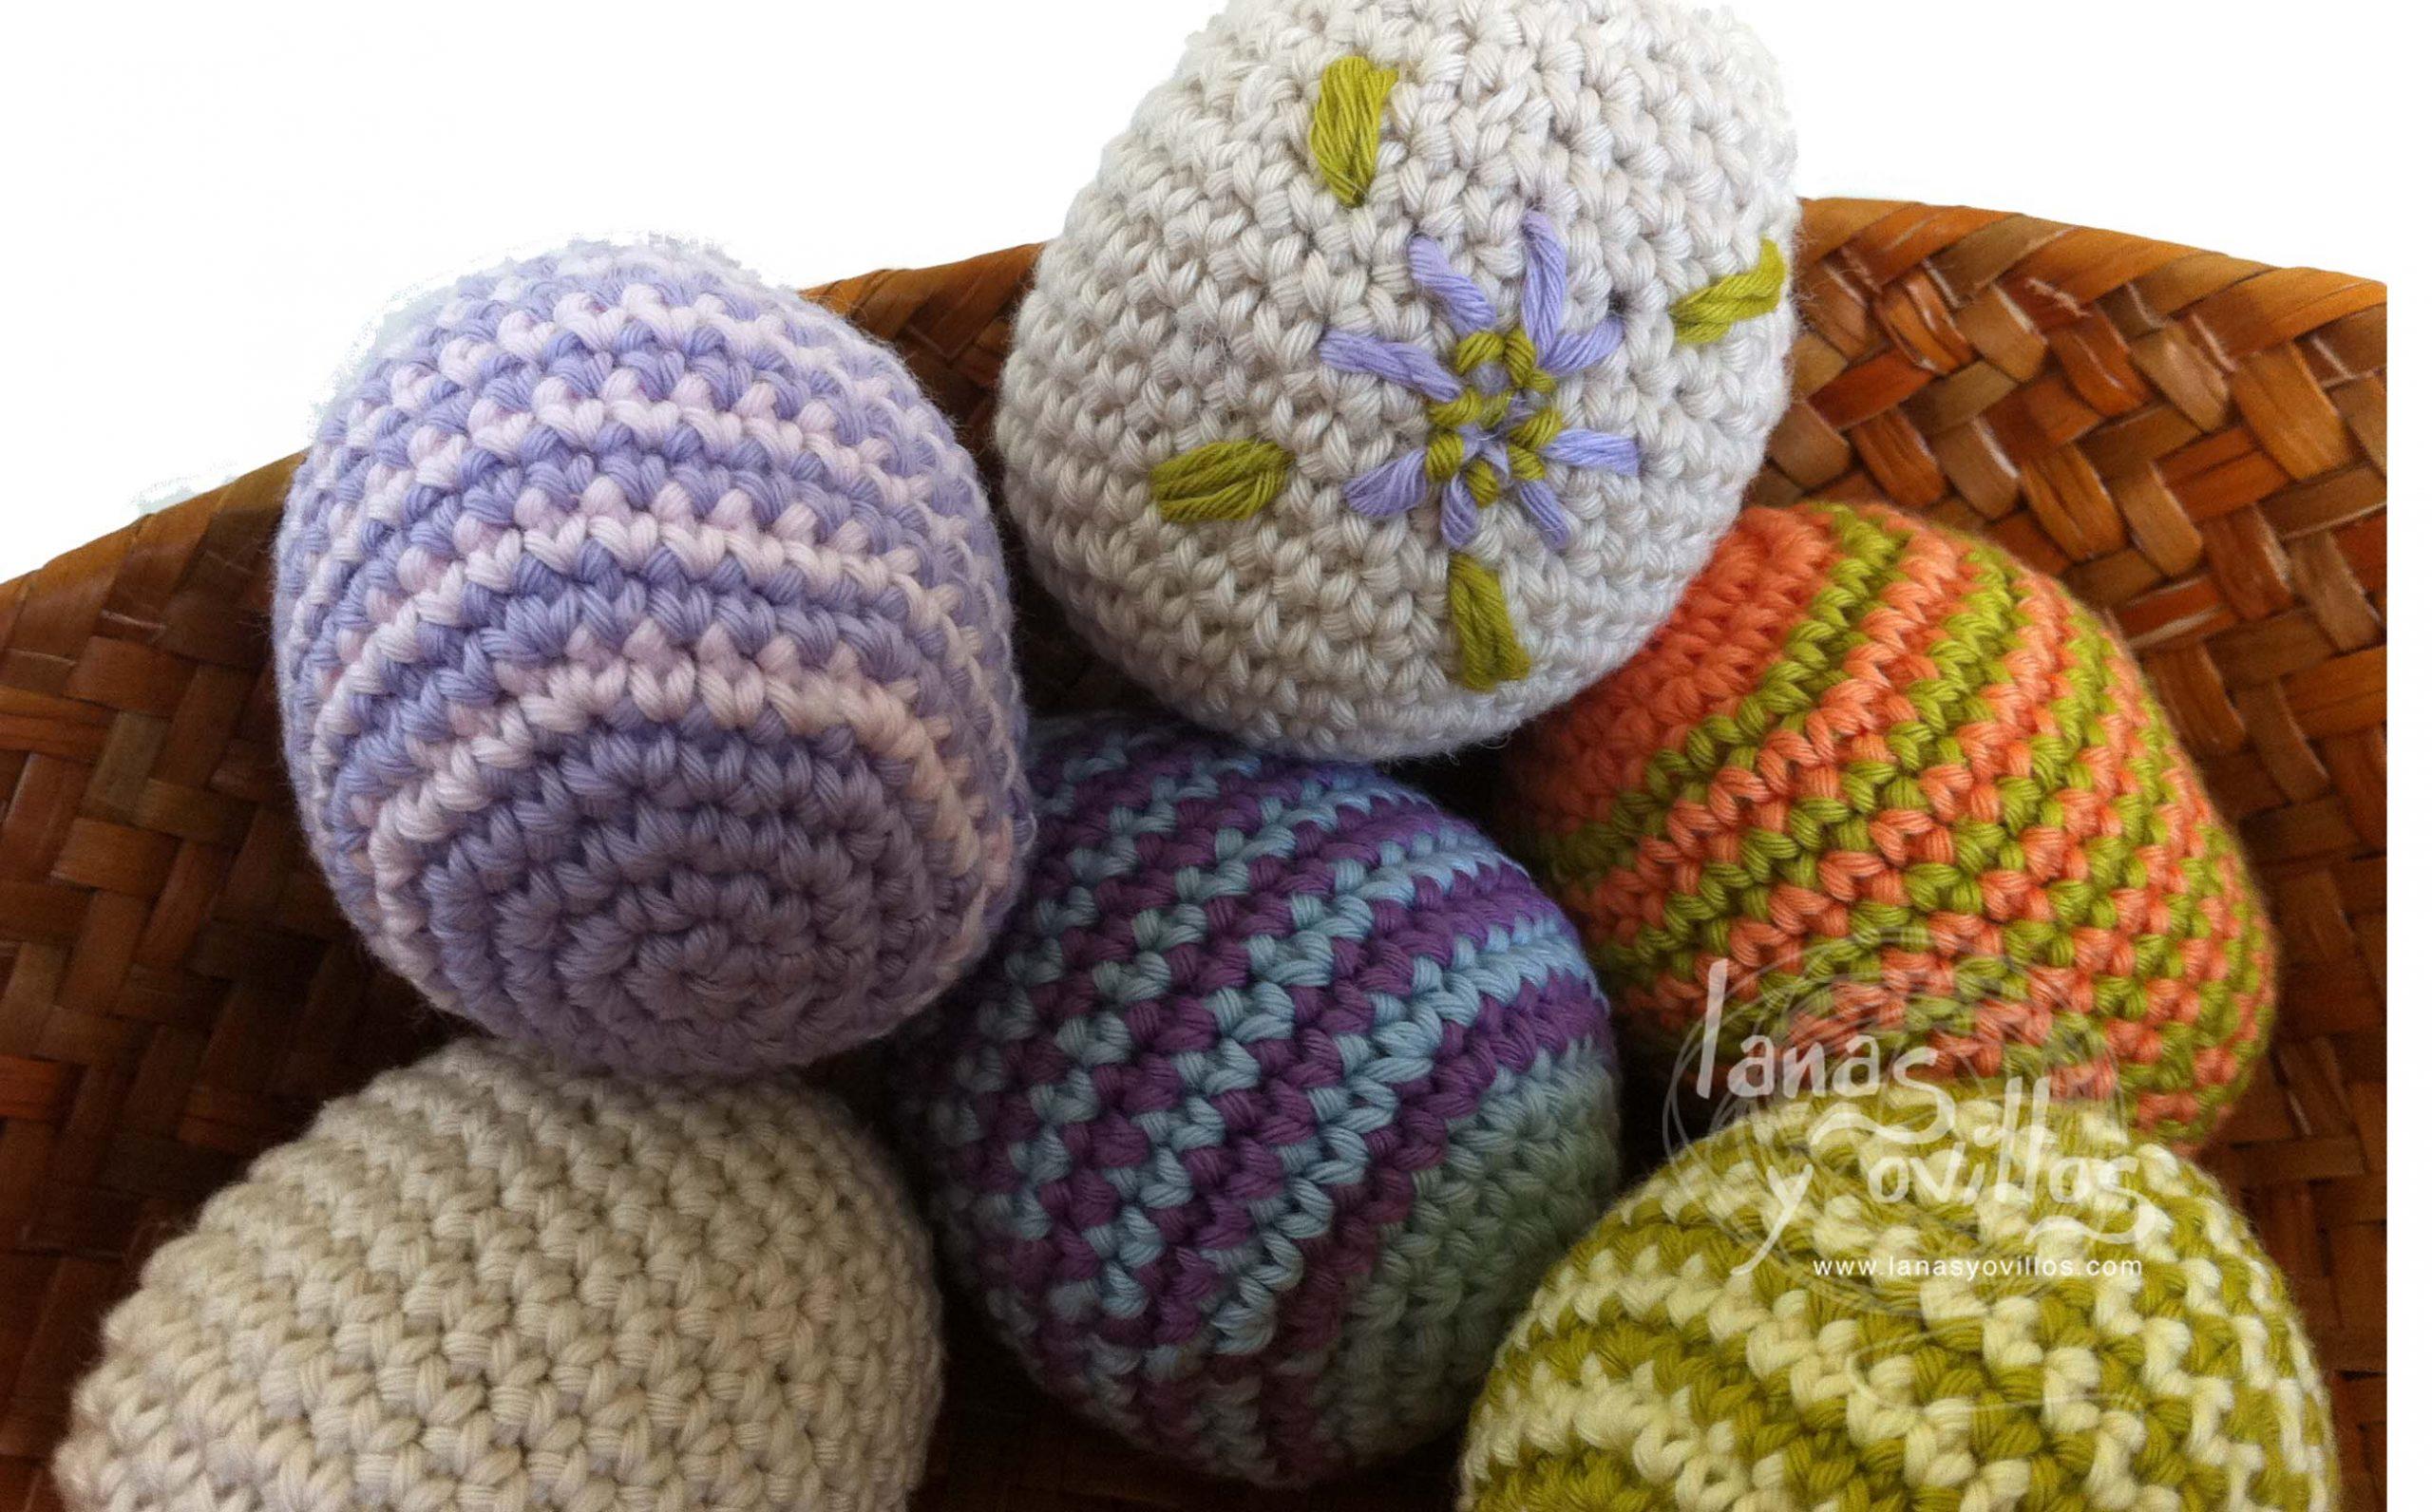 easter eggs amigurumi crochet free pattern with video tutorial